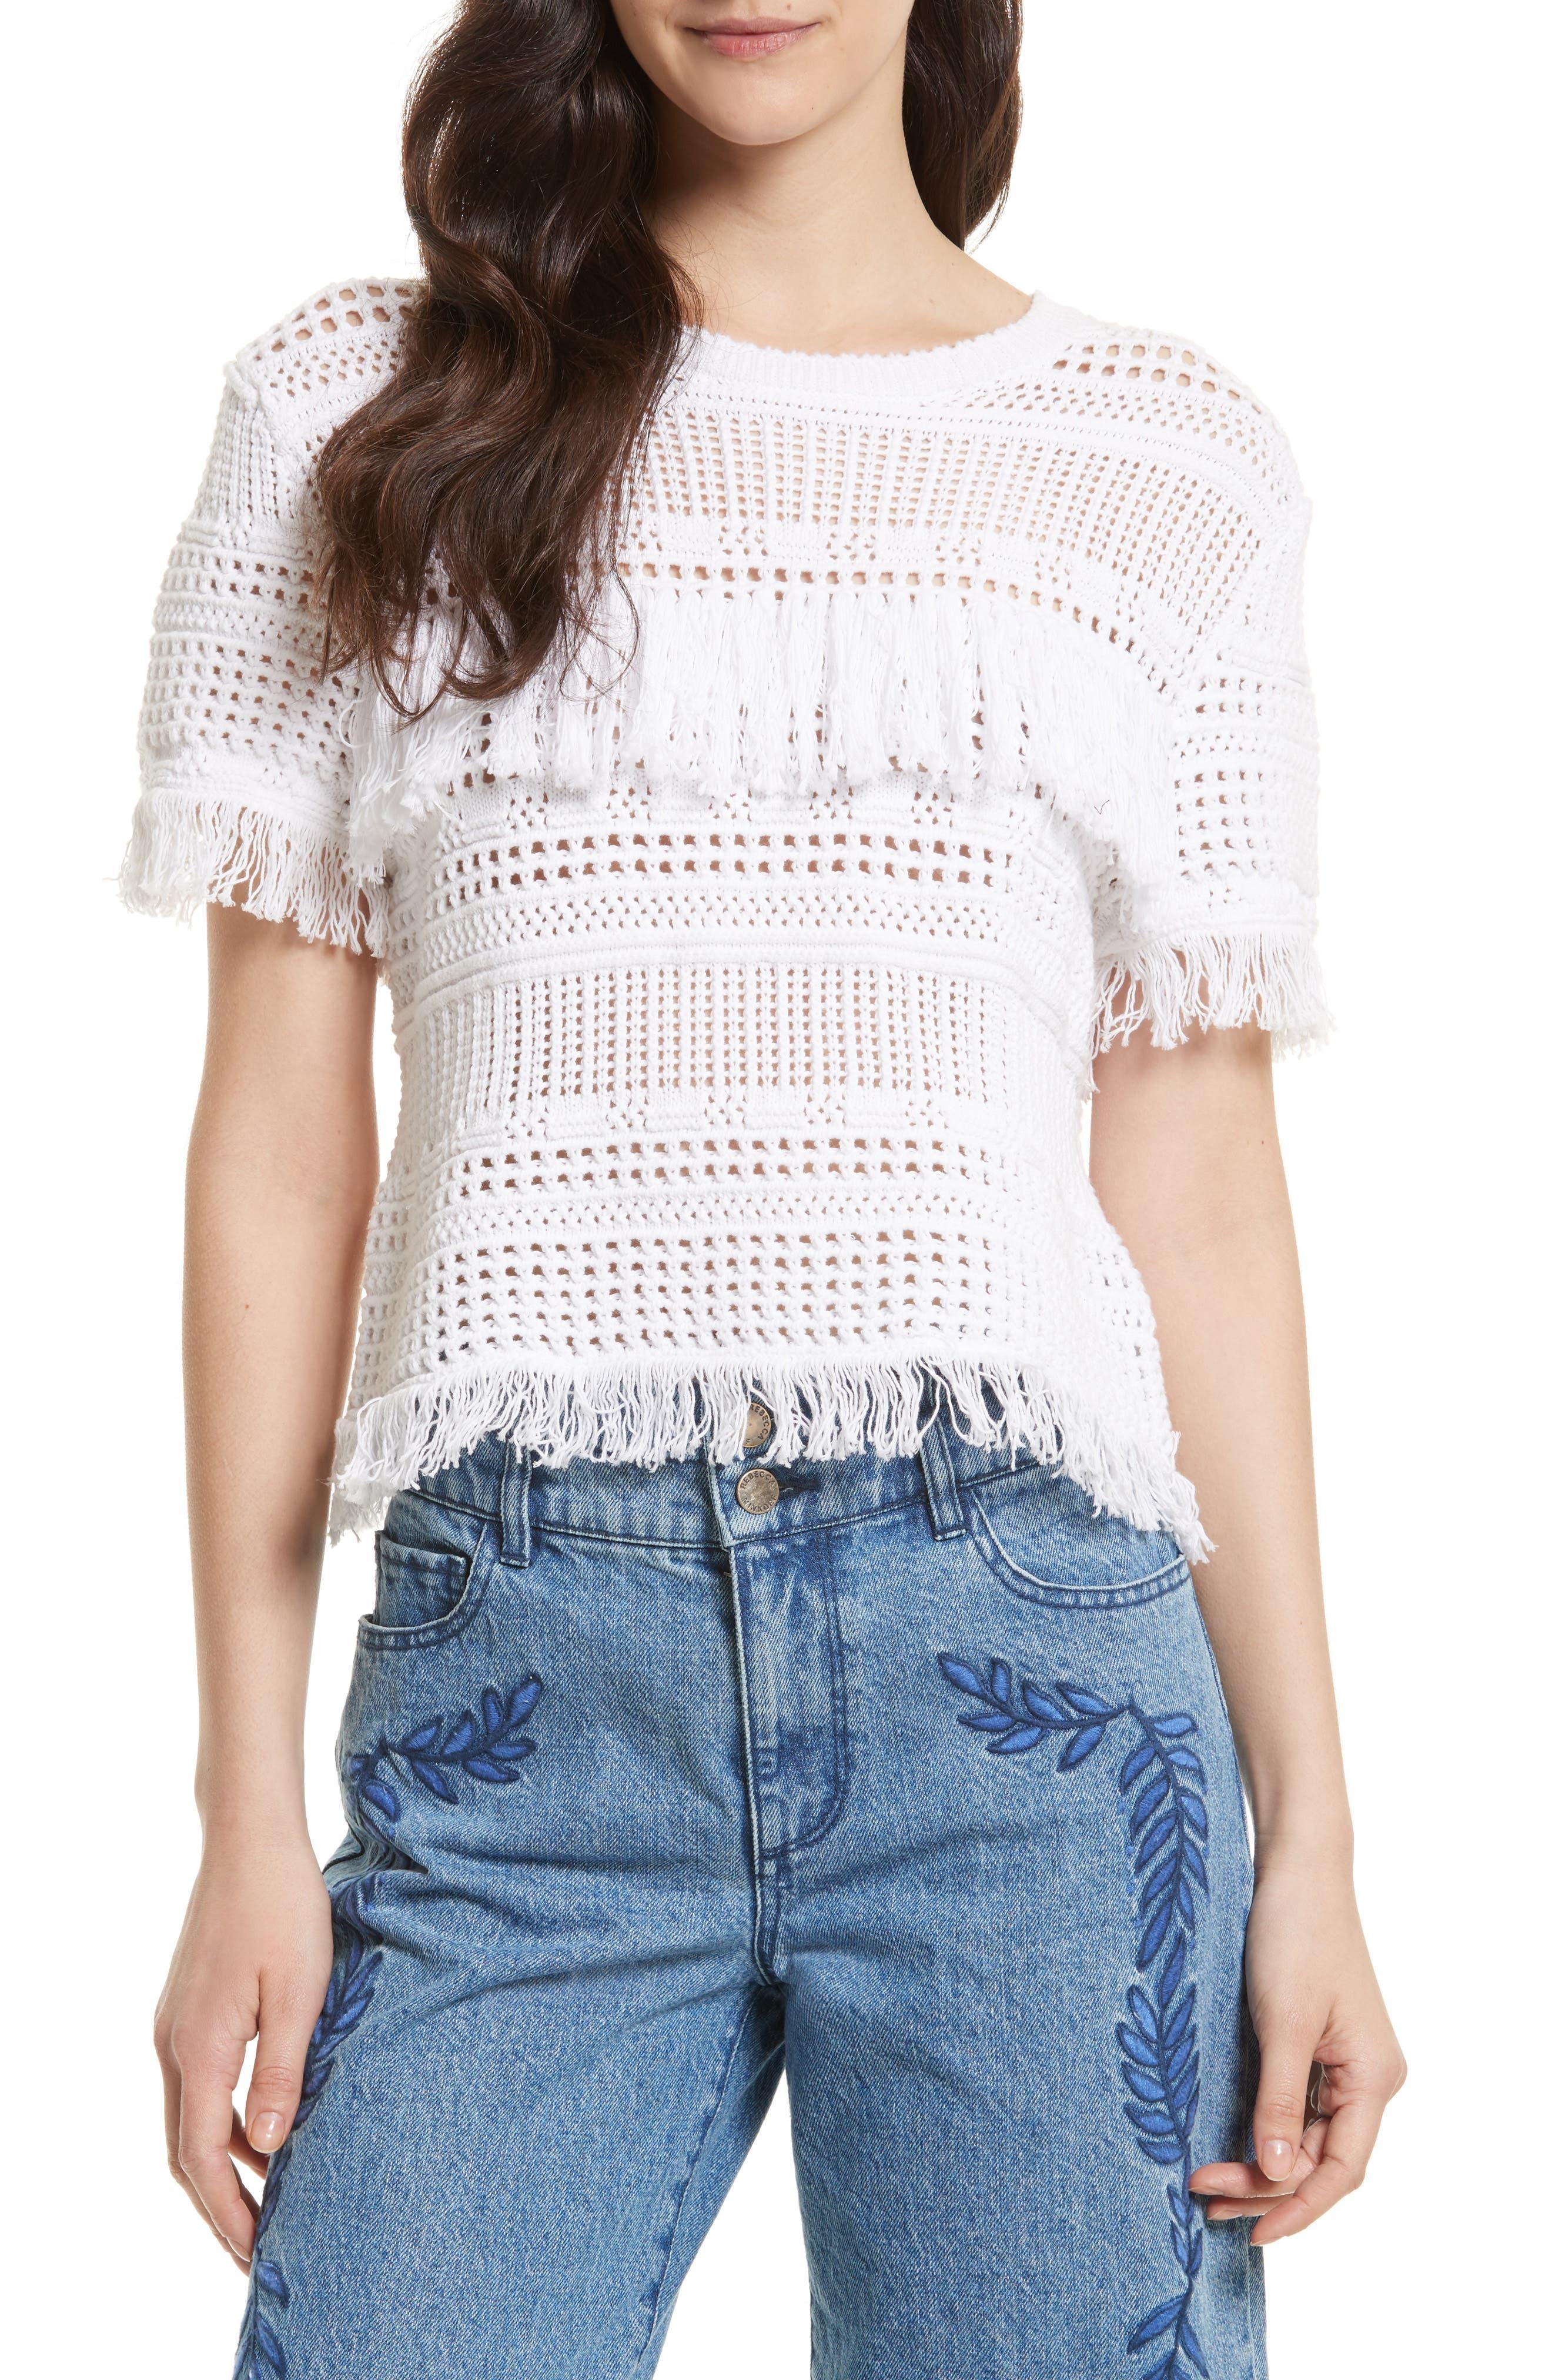 Rebecca Minkoff Miwok Crochet Top